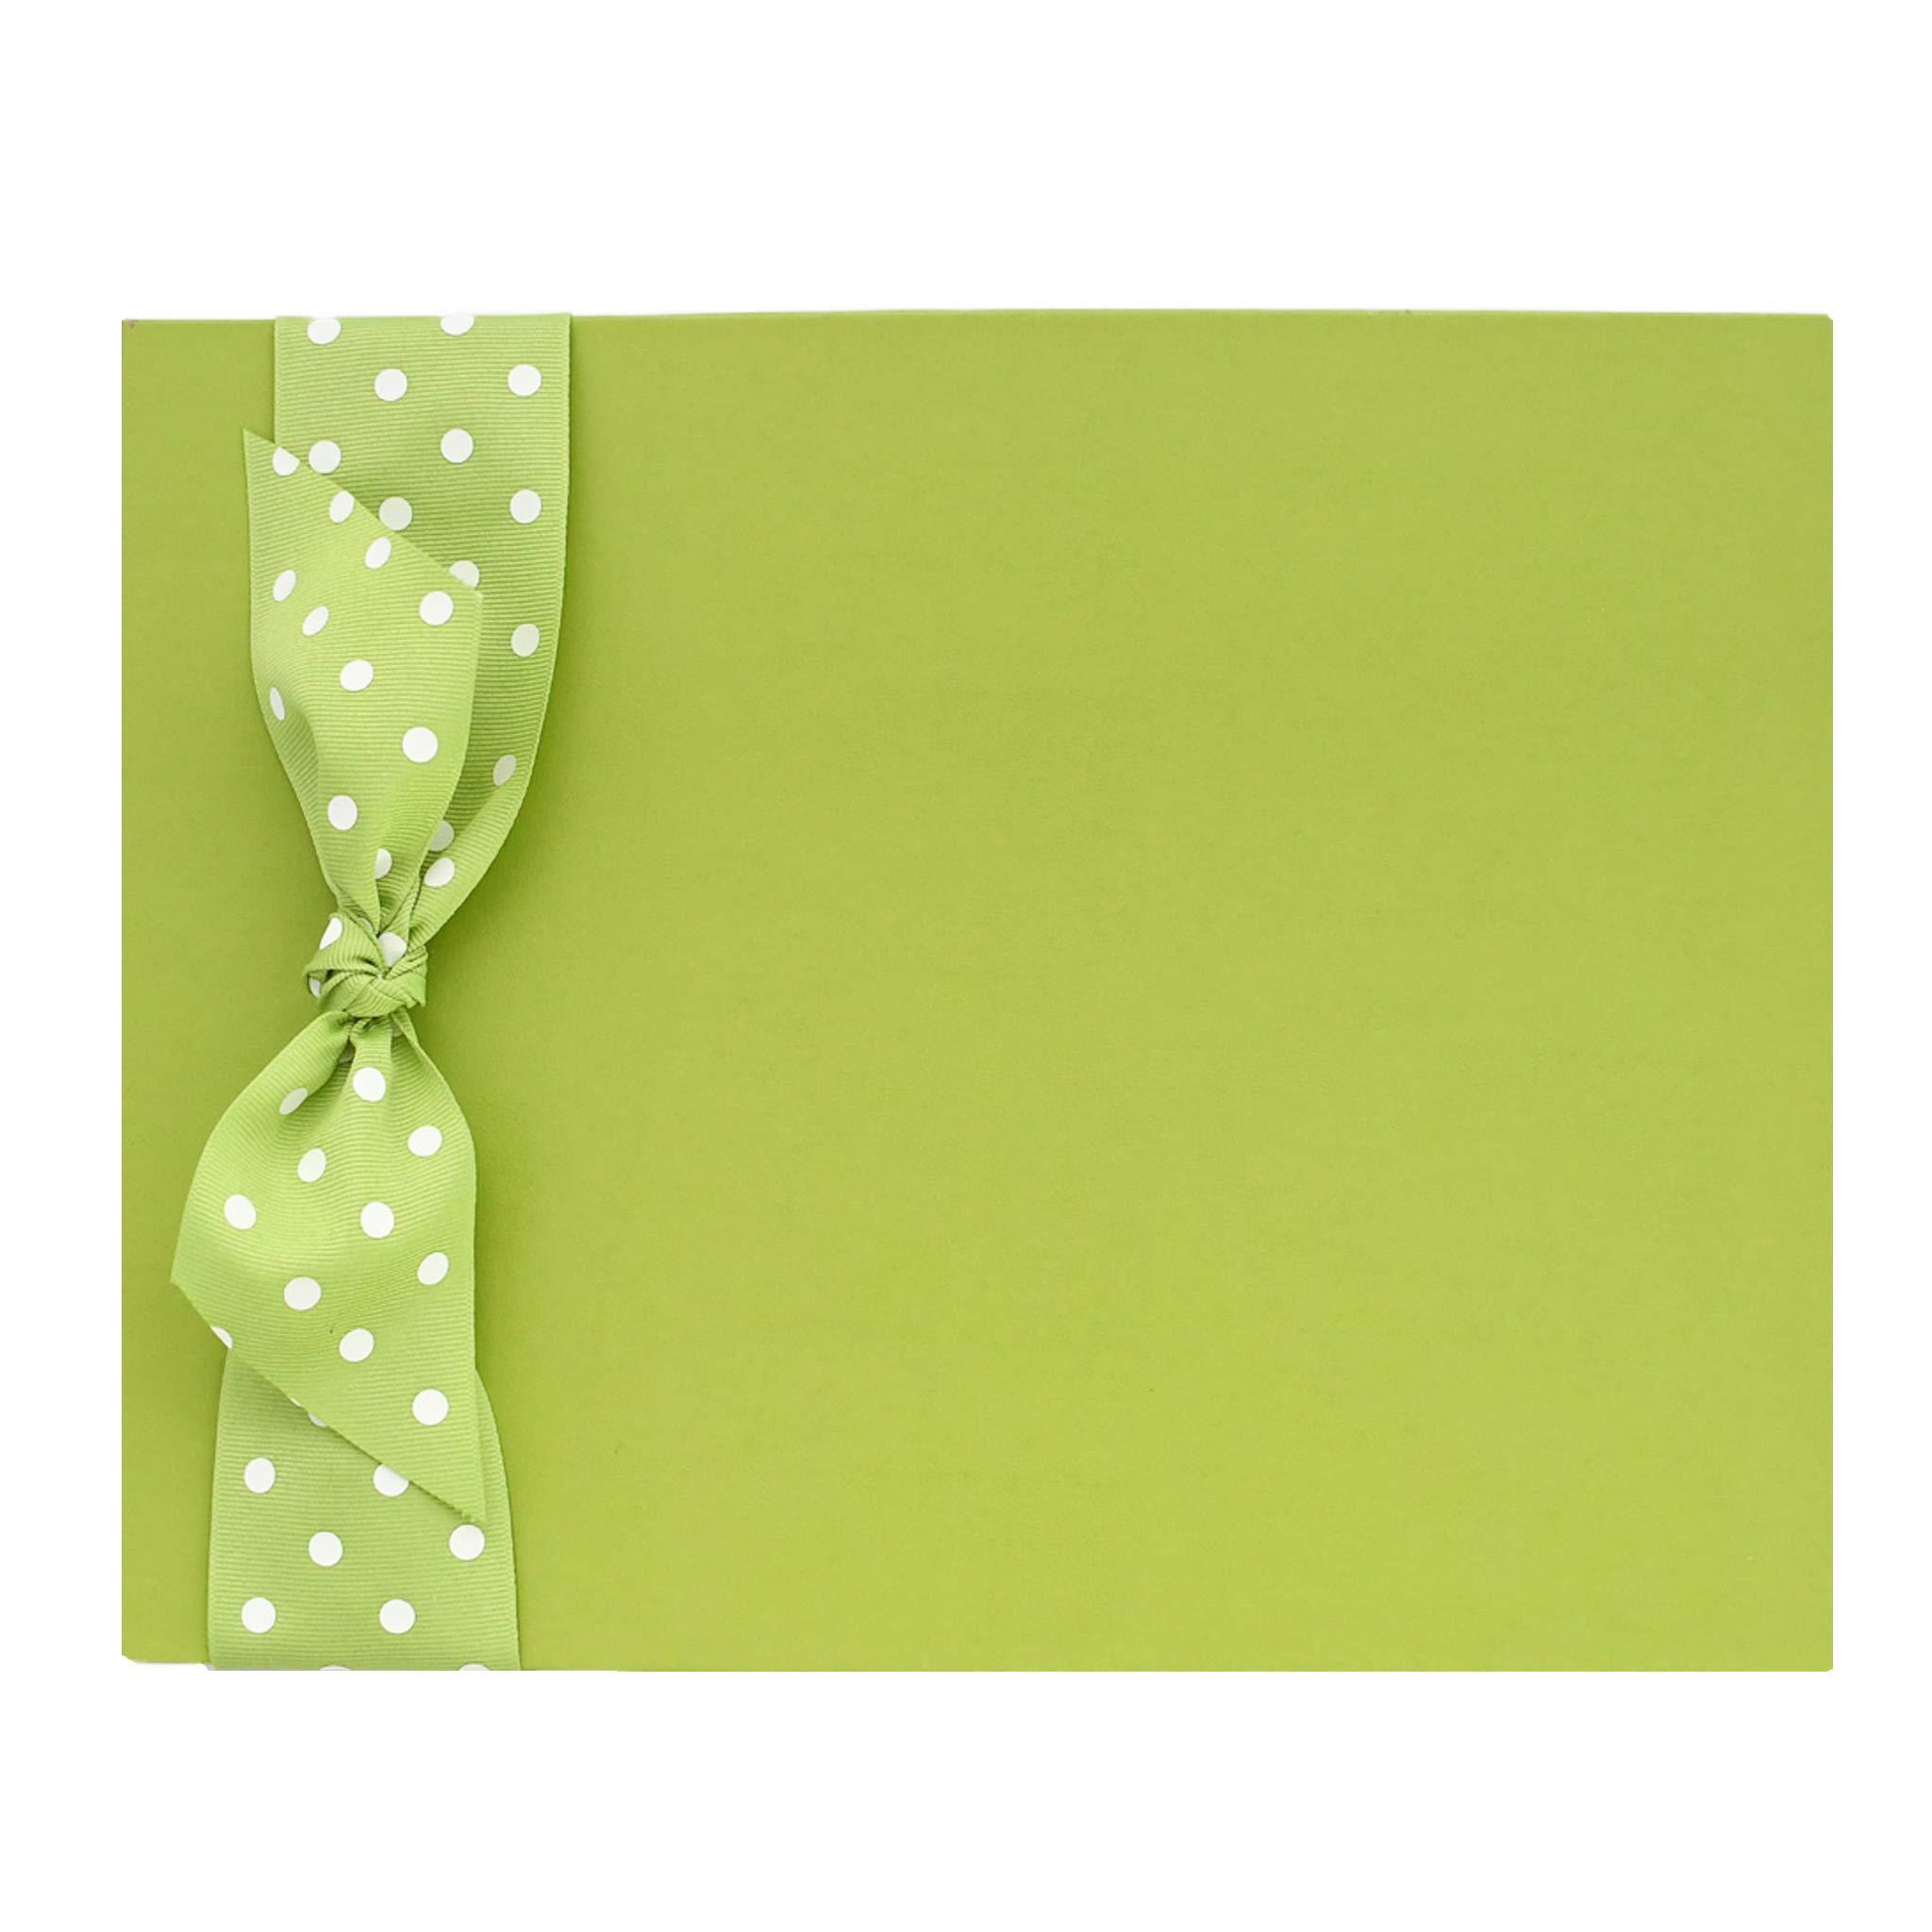 Tessera Baby Memory Book, Modern Gender-Neutral Baby Keepsake, Green Leather with Kiwi Dot Ribbon